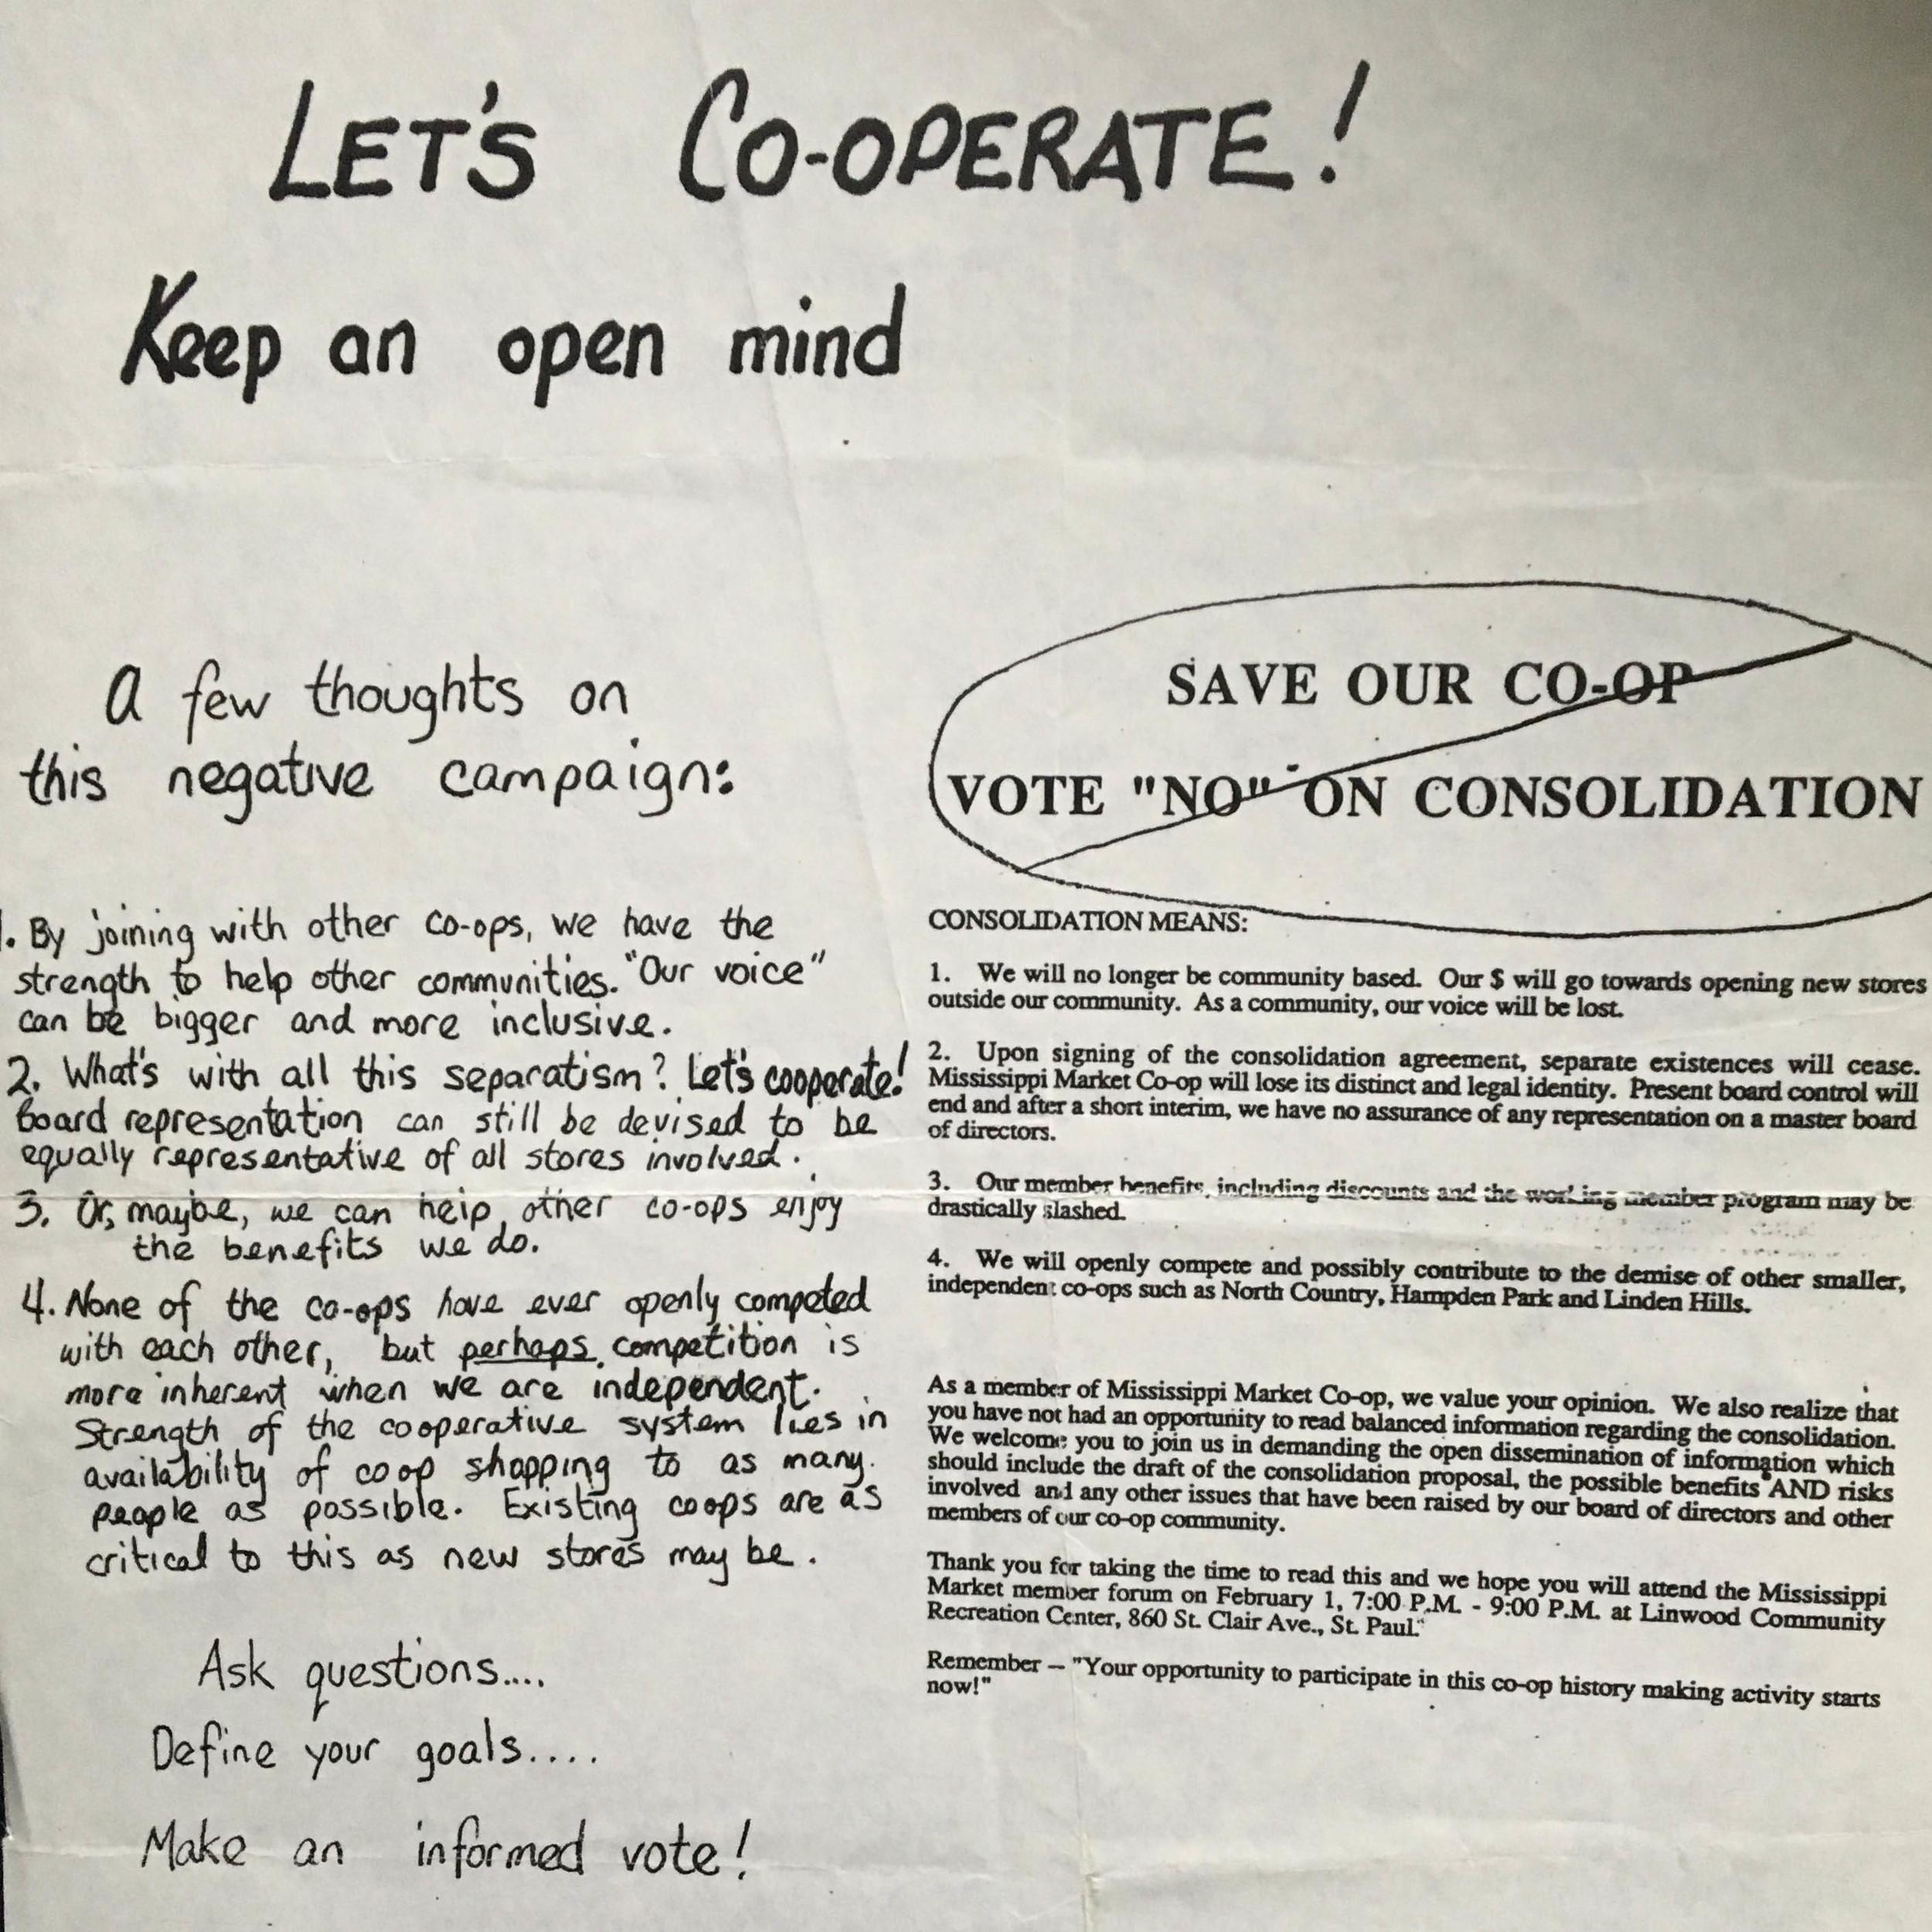 Mississippi Market member and worker Barb Tholin's argument for the 1993 merger proposal.